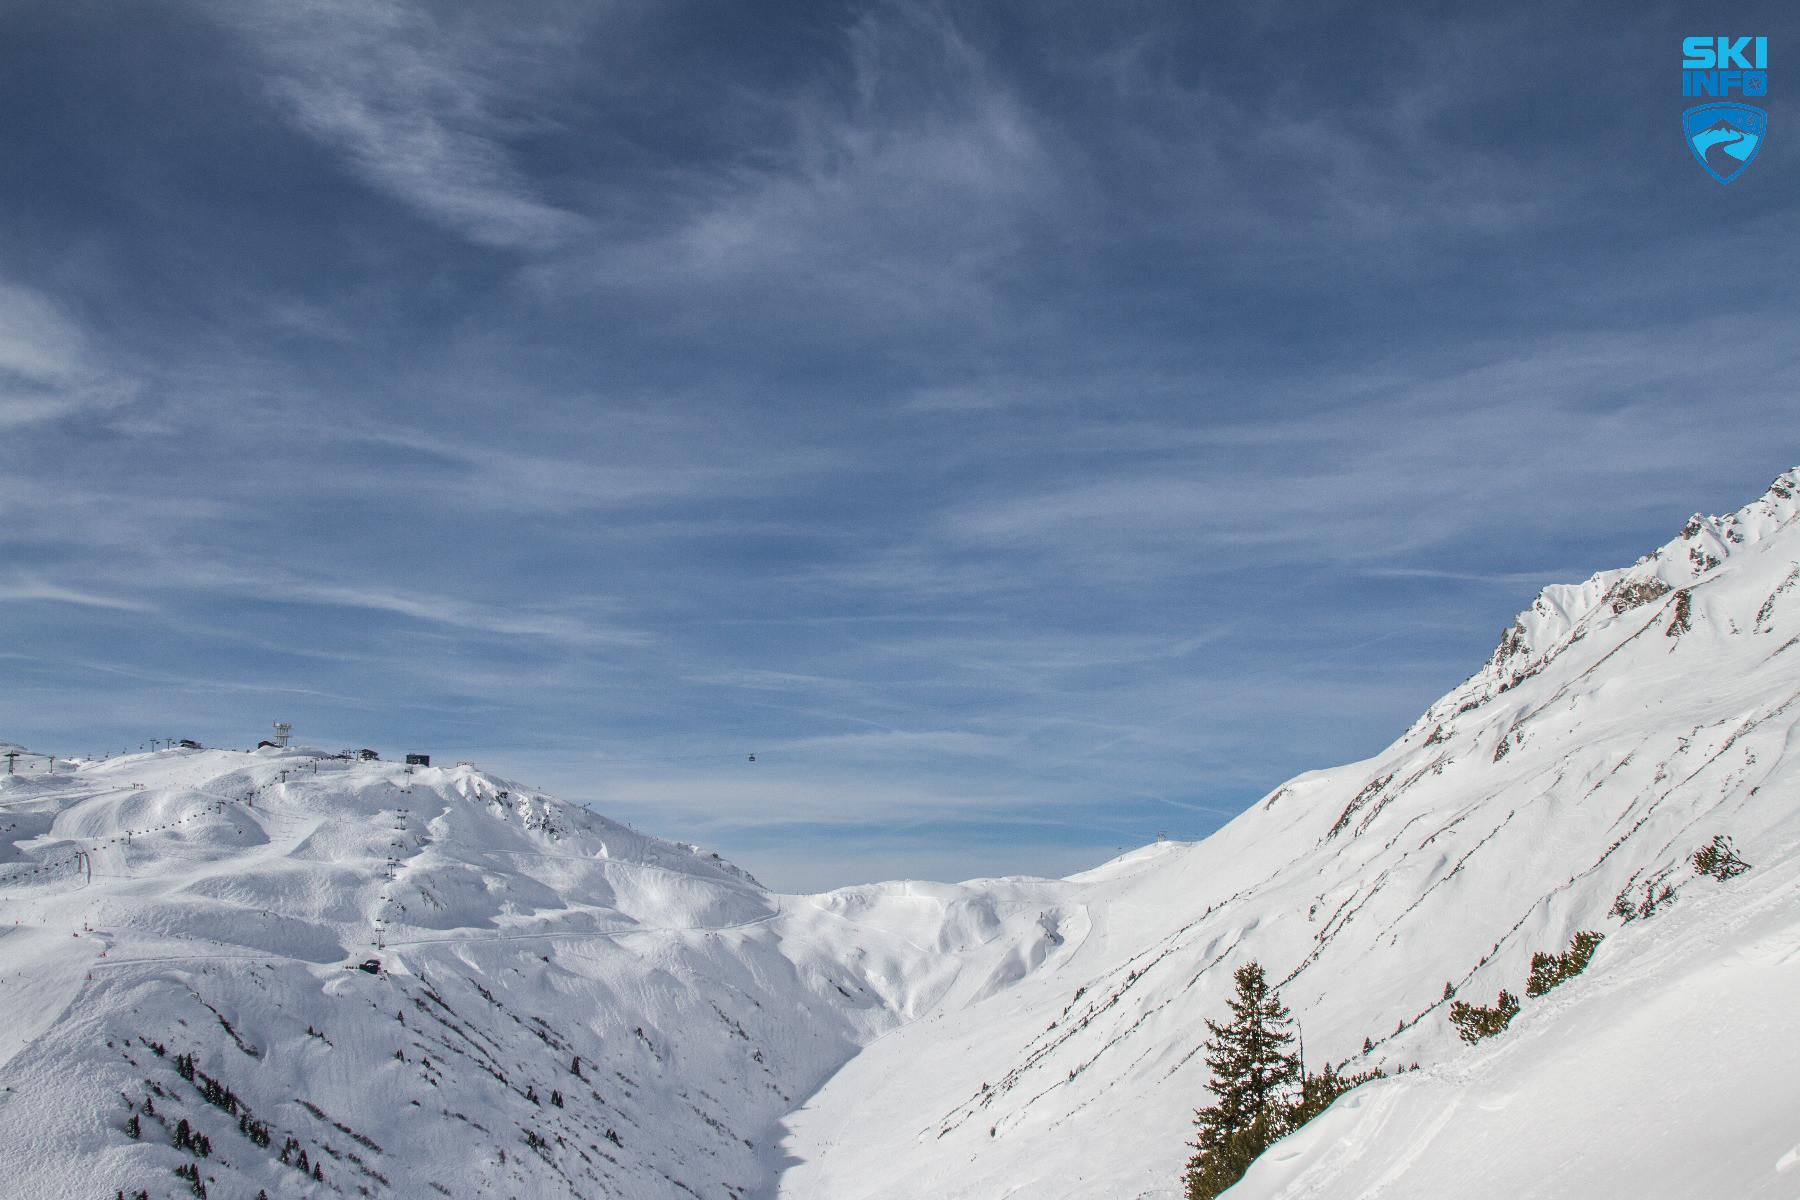 St. Anton am Arlberg | Februar 2016